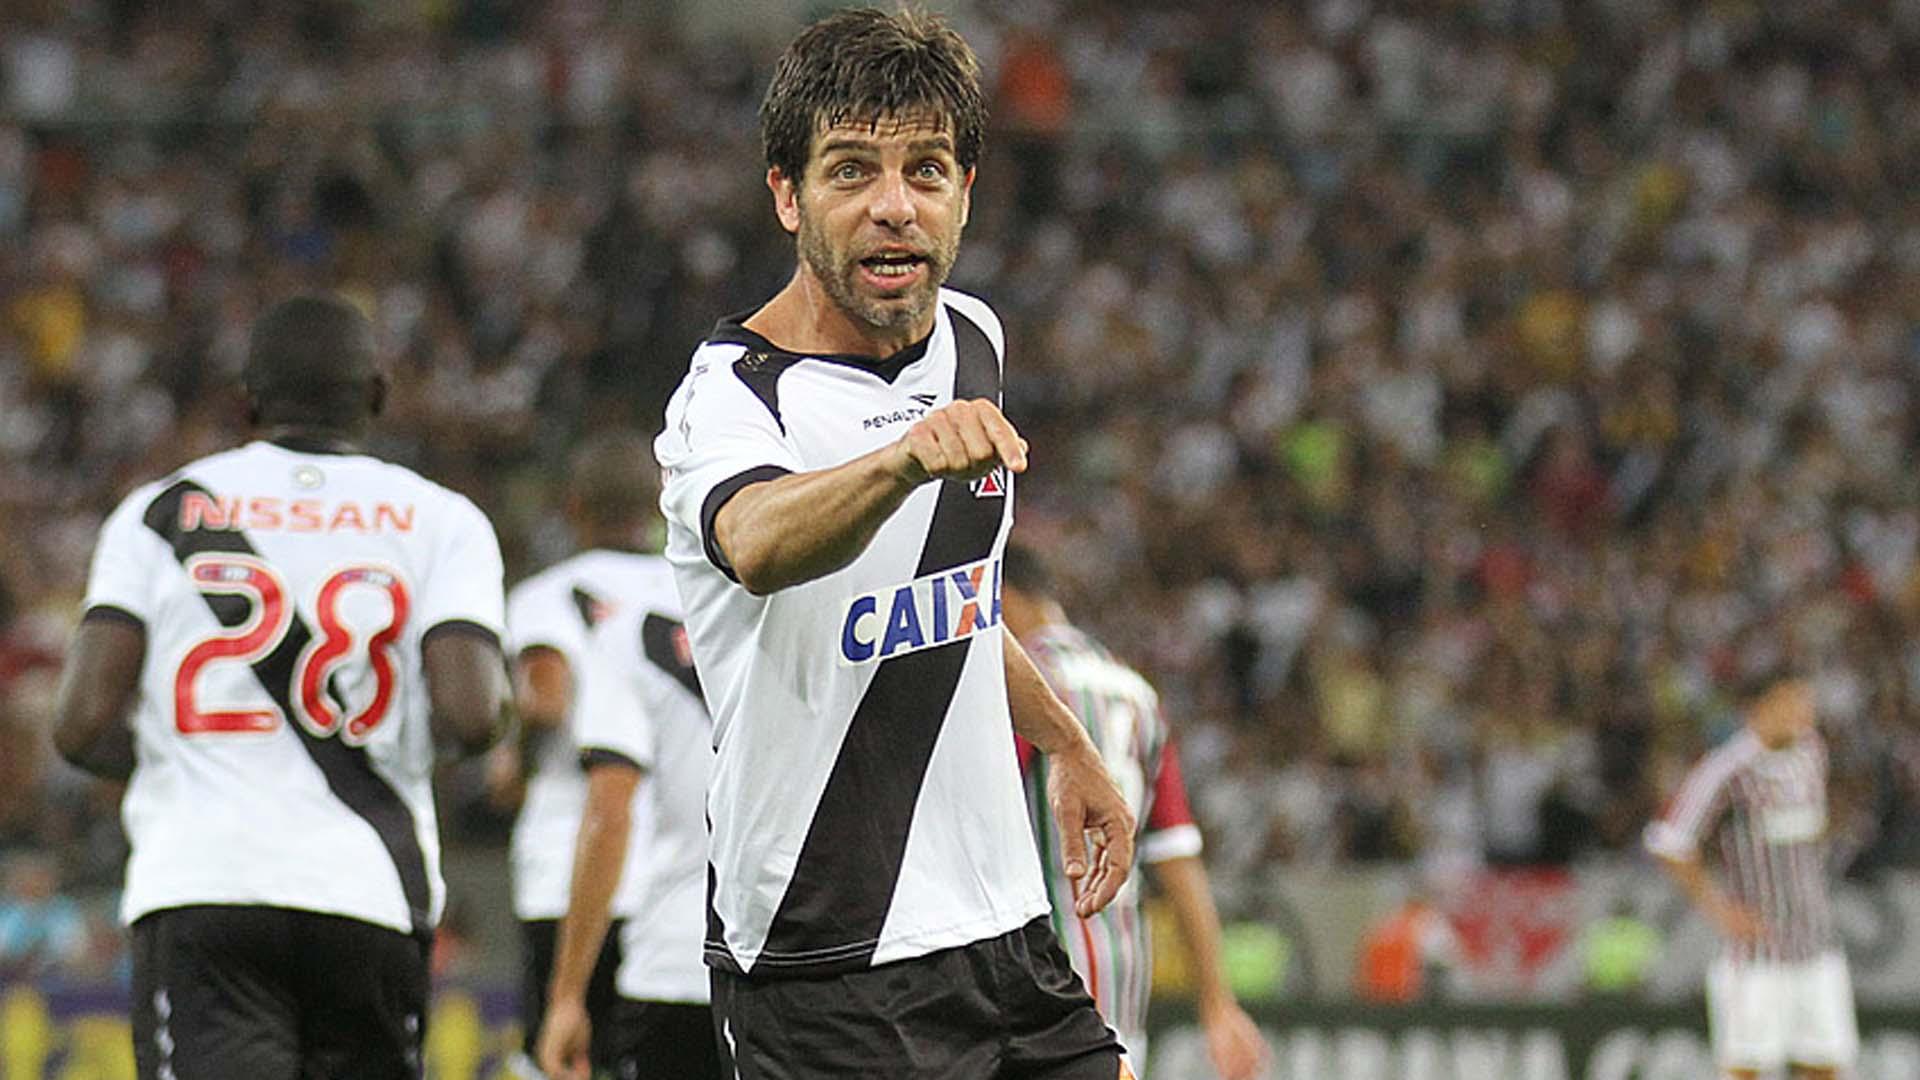 Juninho Pernambucano Vasco x Fluminense Campeonato Carioca 2013